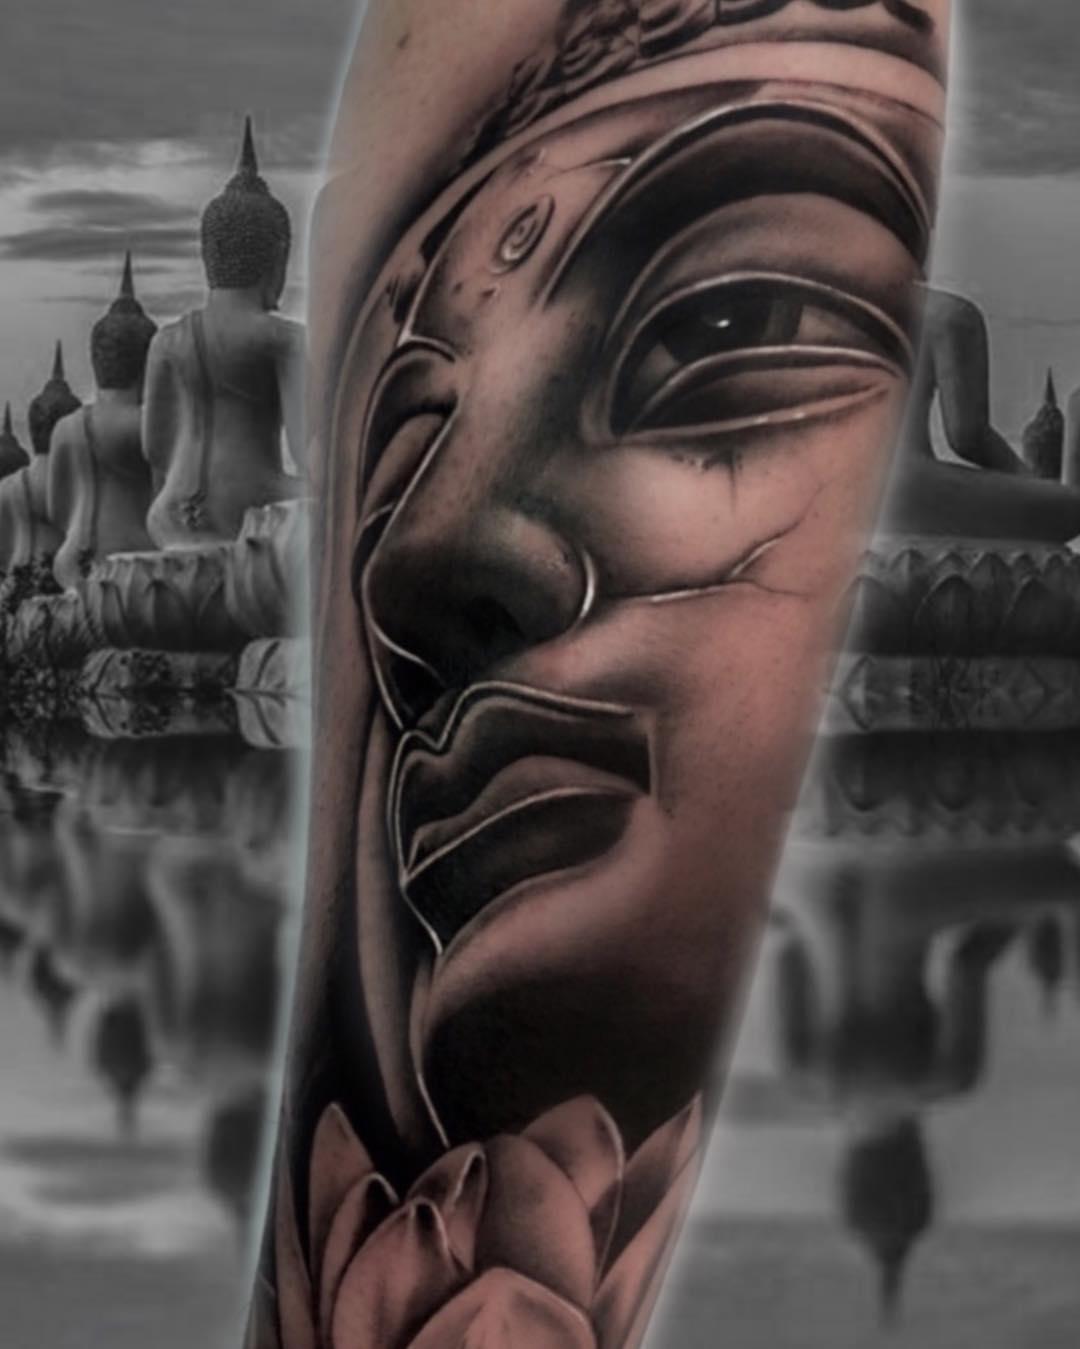 followforfollow,followmeciudadreal,ciudadreal,tomelloso,almagro,puertollano,tatuajesenpuertollano,tatuajesendaimiel,ciudadrealtattoo,ciudadrealtatuajes,tatuajesciudadreal,follow,ciudadrealtatuajes,puertollano,ciudadreal,tattoos,ciudadrealtattoo,tattooers,besttattooers,juantabasco,ciudadrealsetatua,ink,tatuajes,realismo,realistictattoo,ciudadrealtattoo,tatuajesenpuertollano,traditionaltattoos,castillalamancha,ink,tattooart,thebestspaintattooartists,maxonmotortattoo